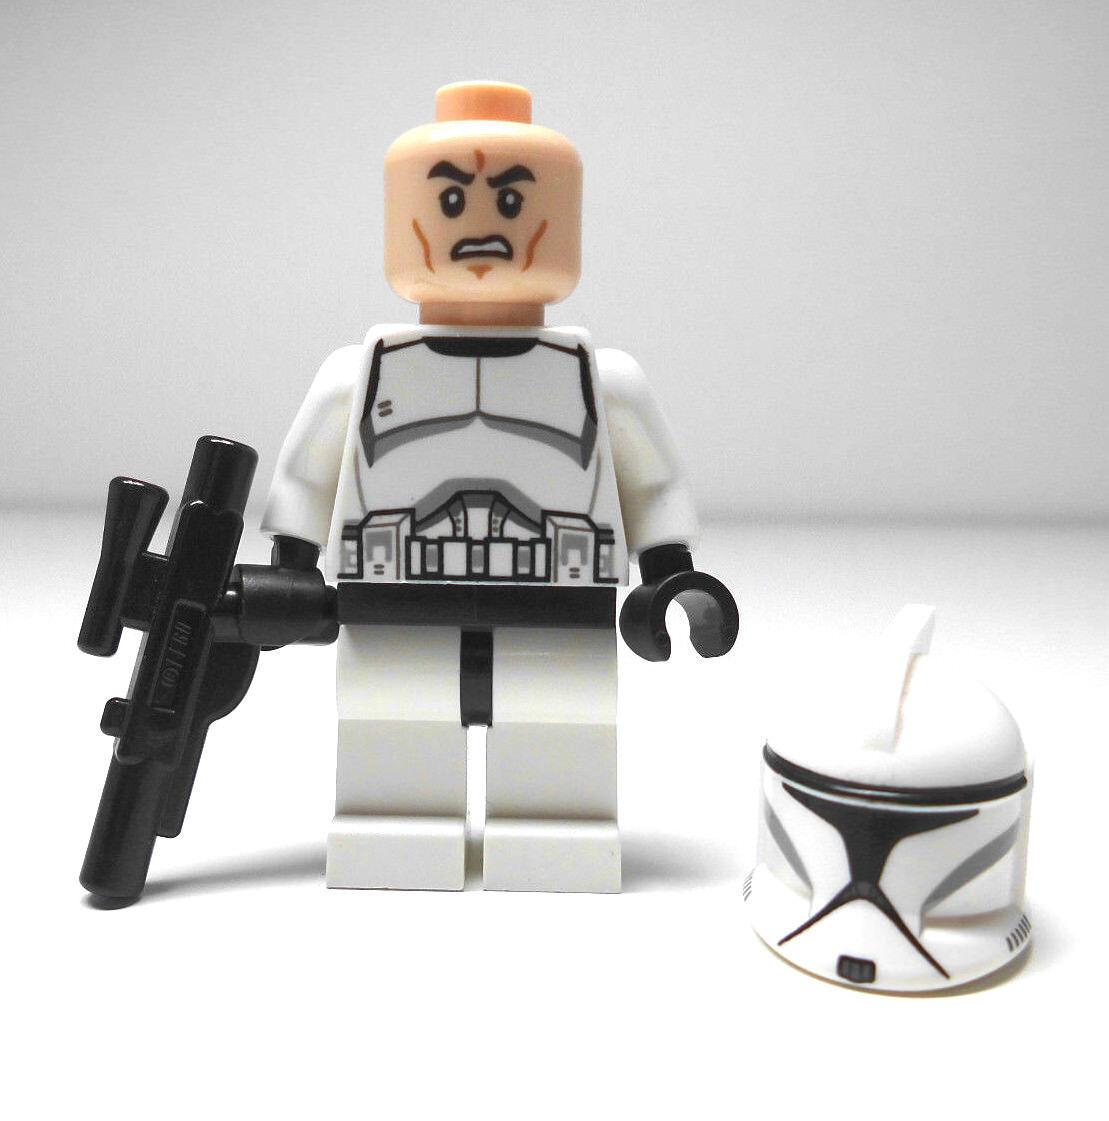 LEGO STAR WARS Personnage Clone Soldat Neuf 75000 75015 75016 s'adapte 8014 8018 | Brillance De Couleur